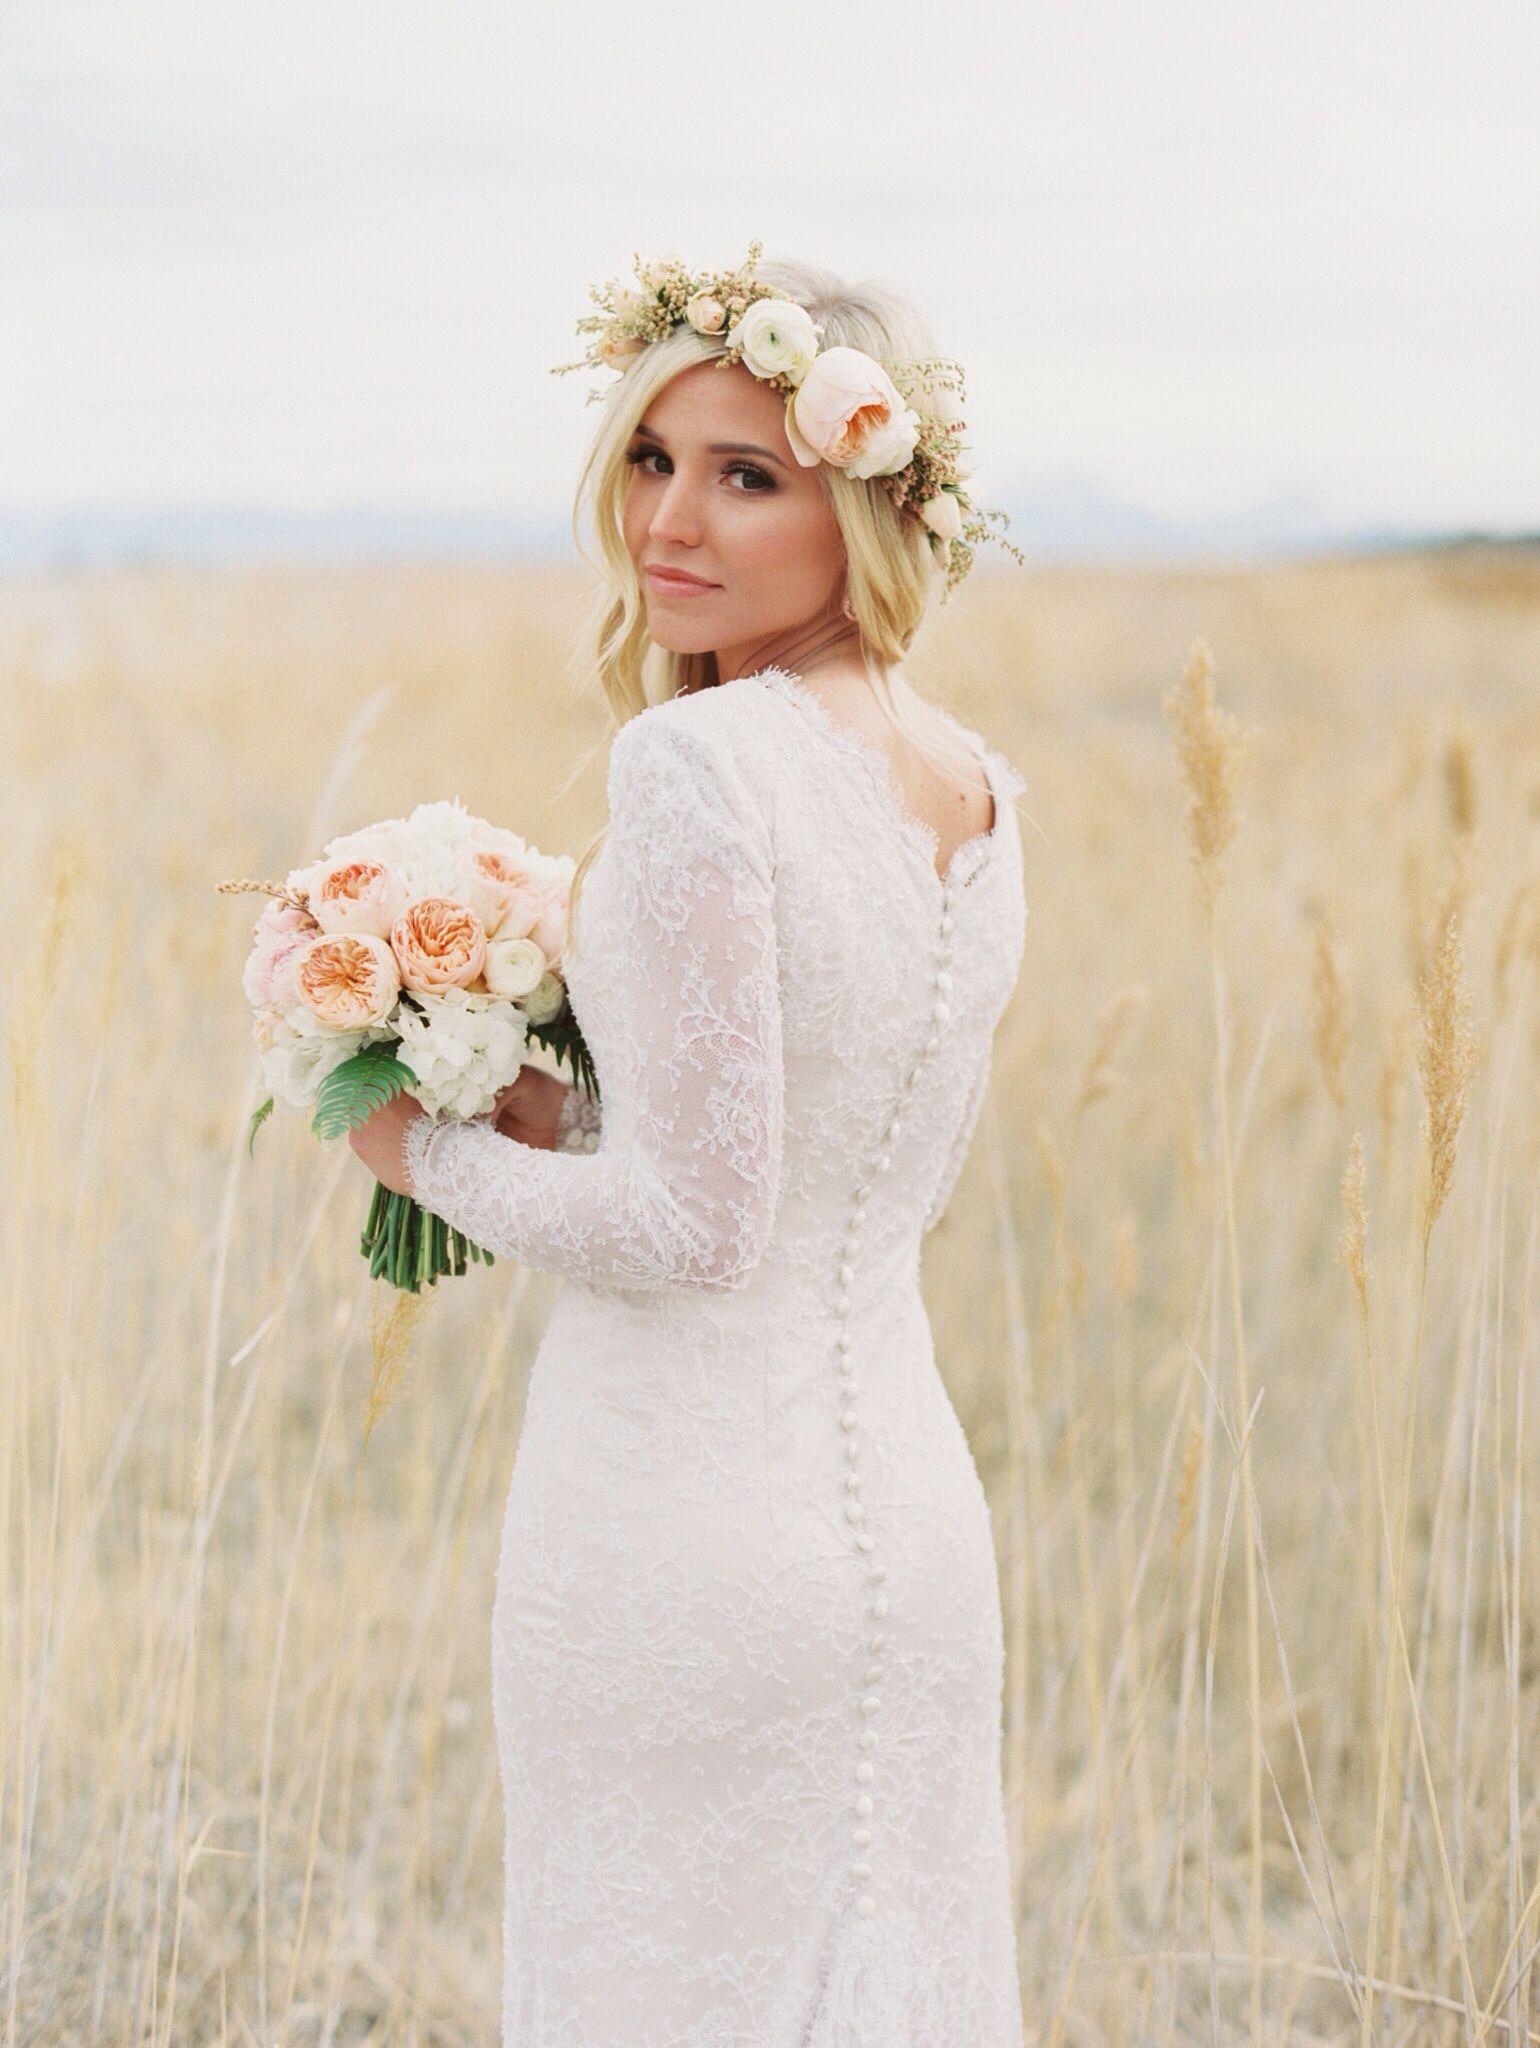 beauty | wedding photography | floral crown wedding, wedding